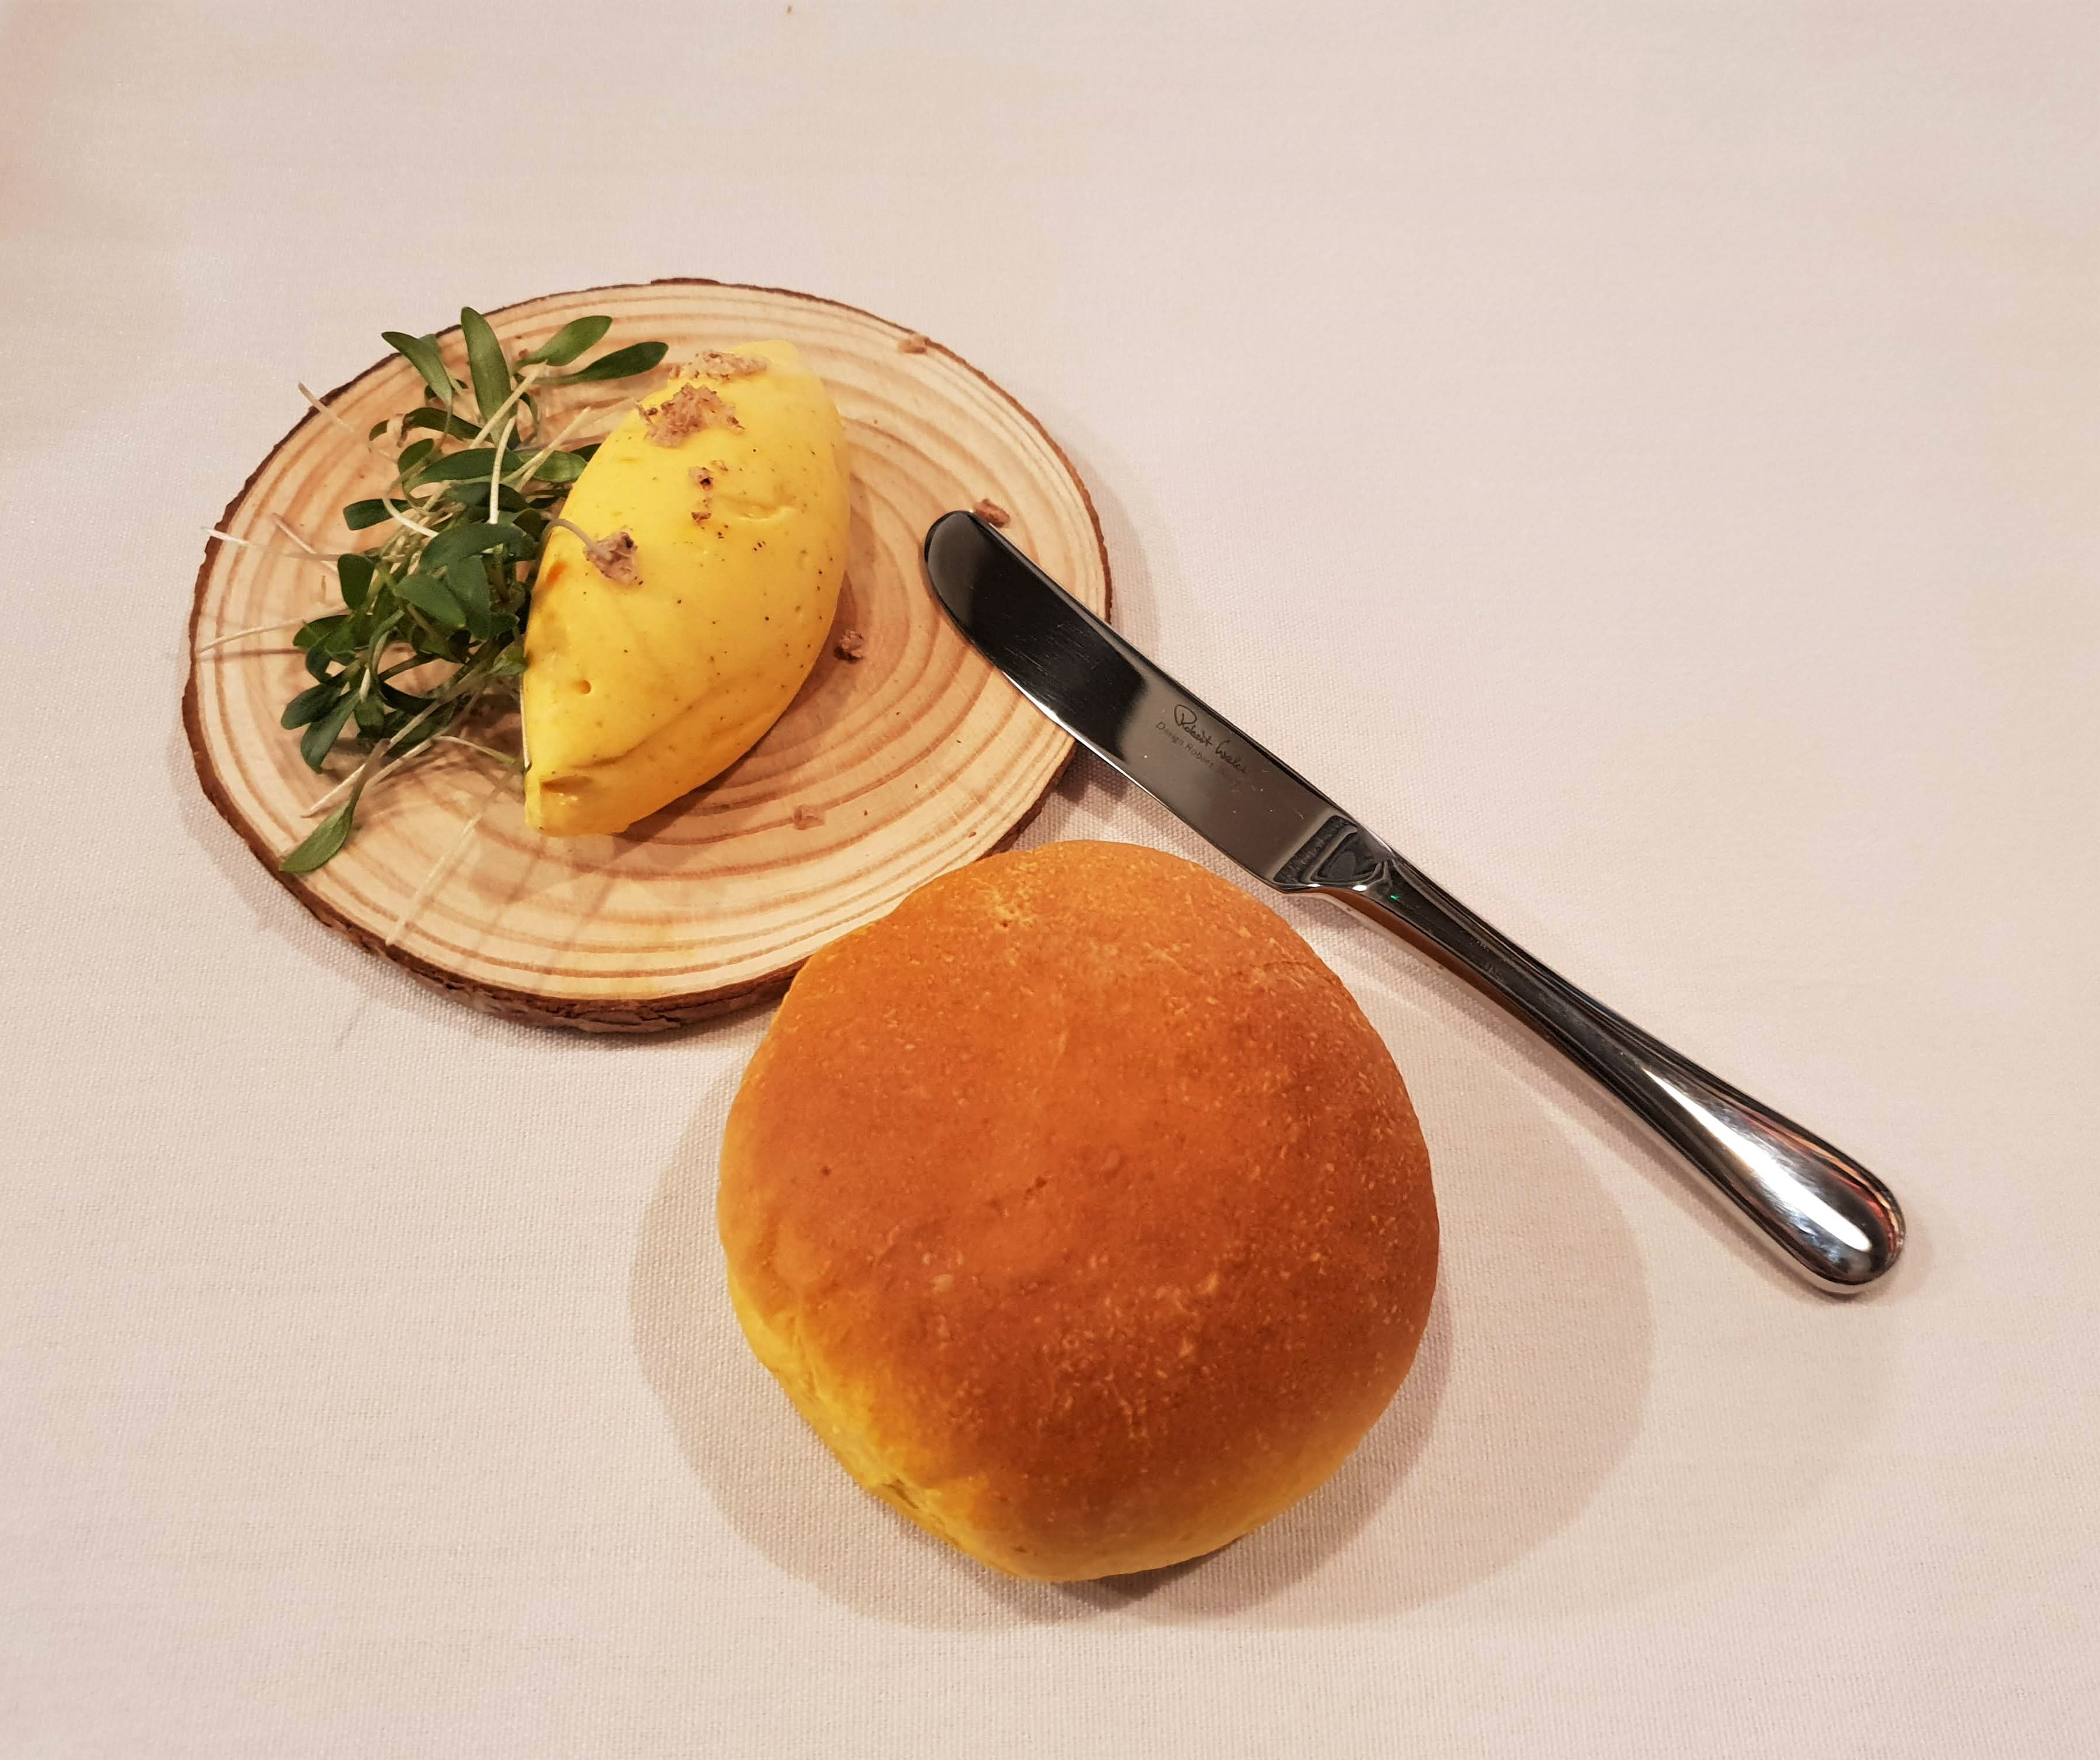 Myristica Pumpkin bread